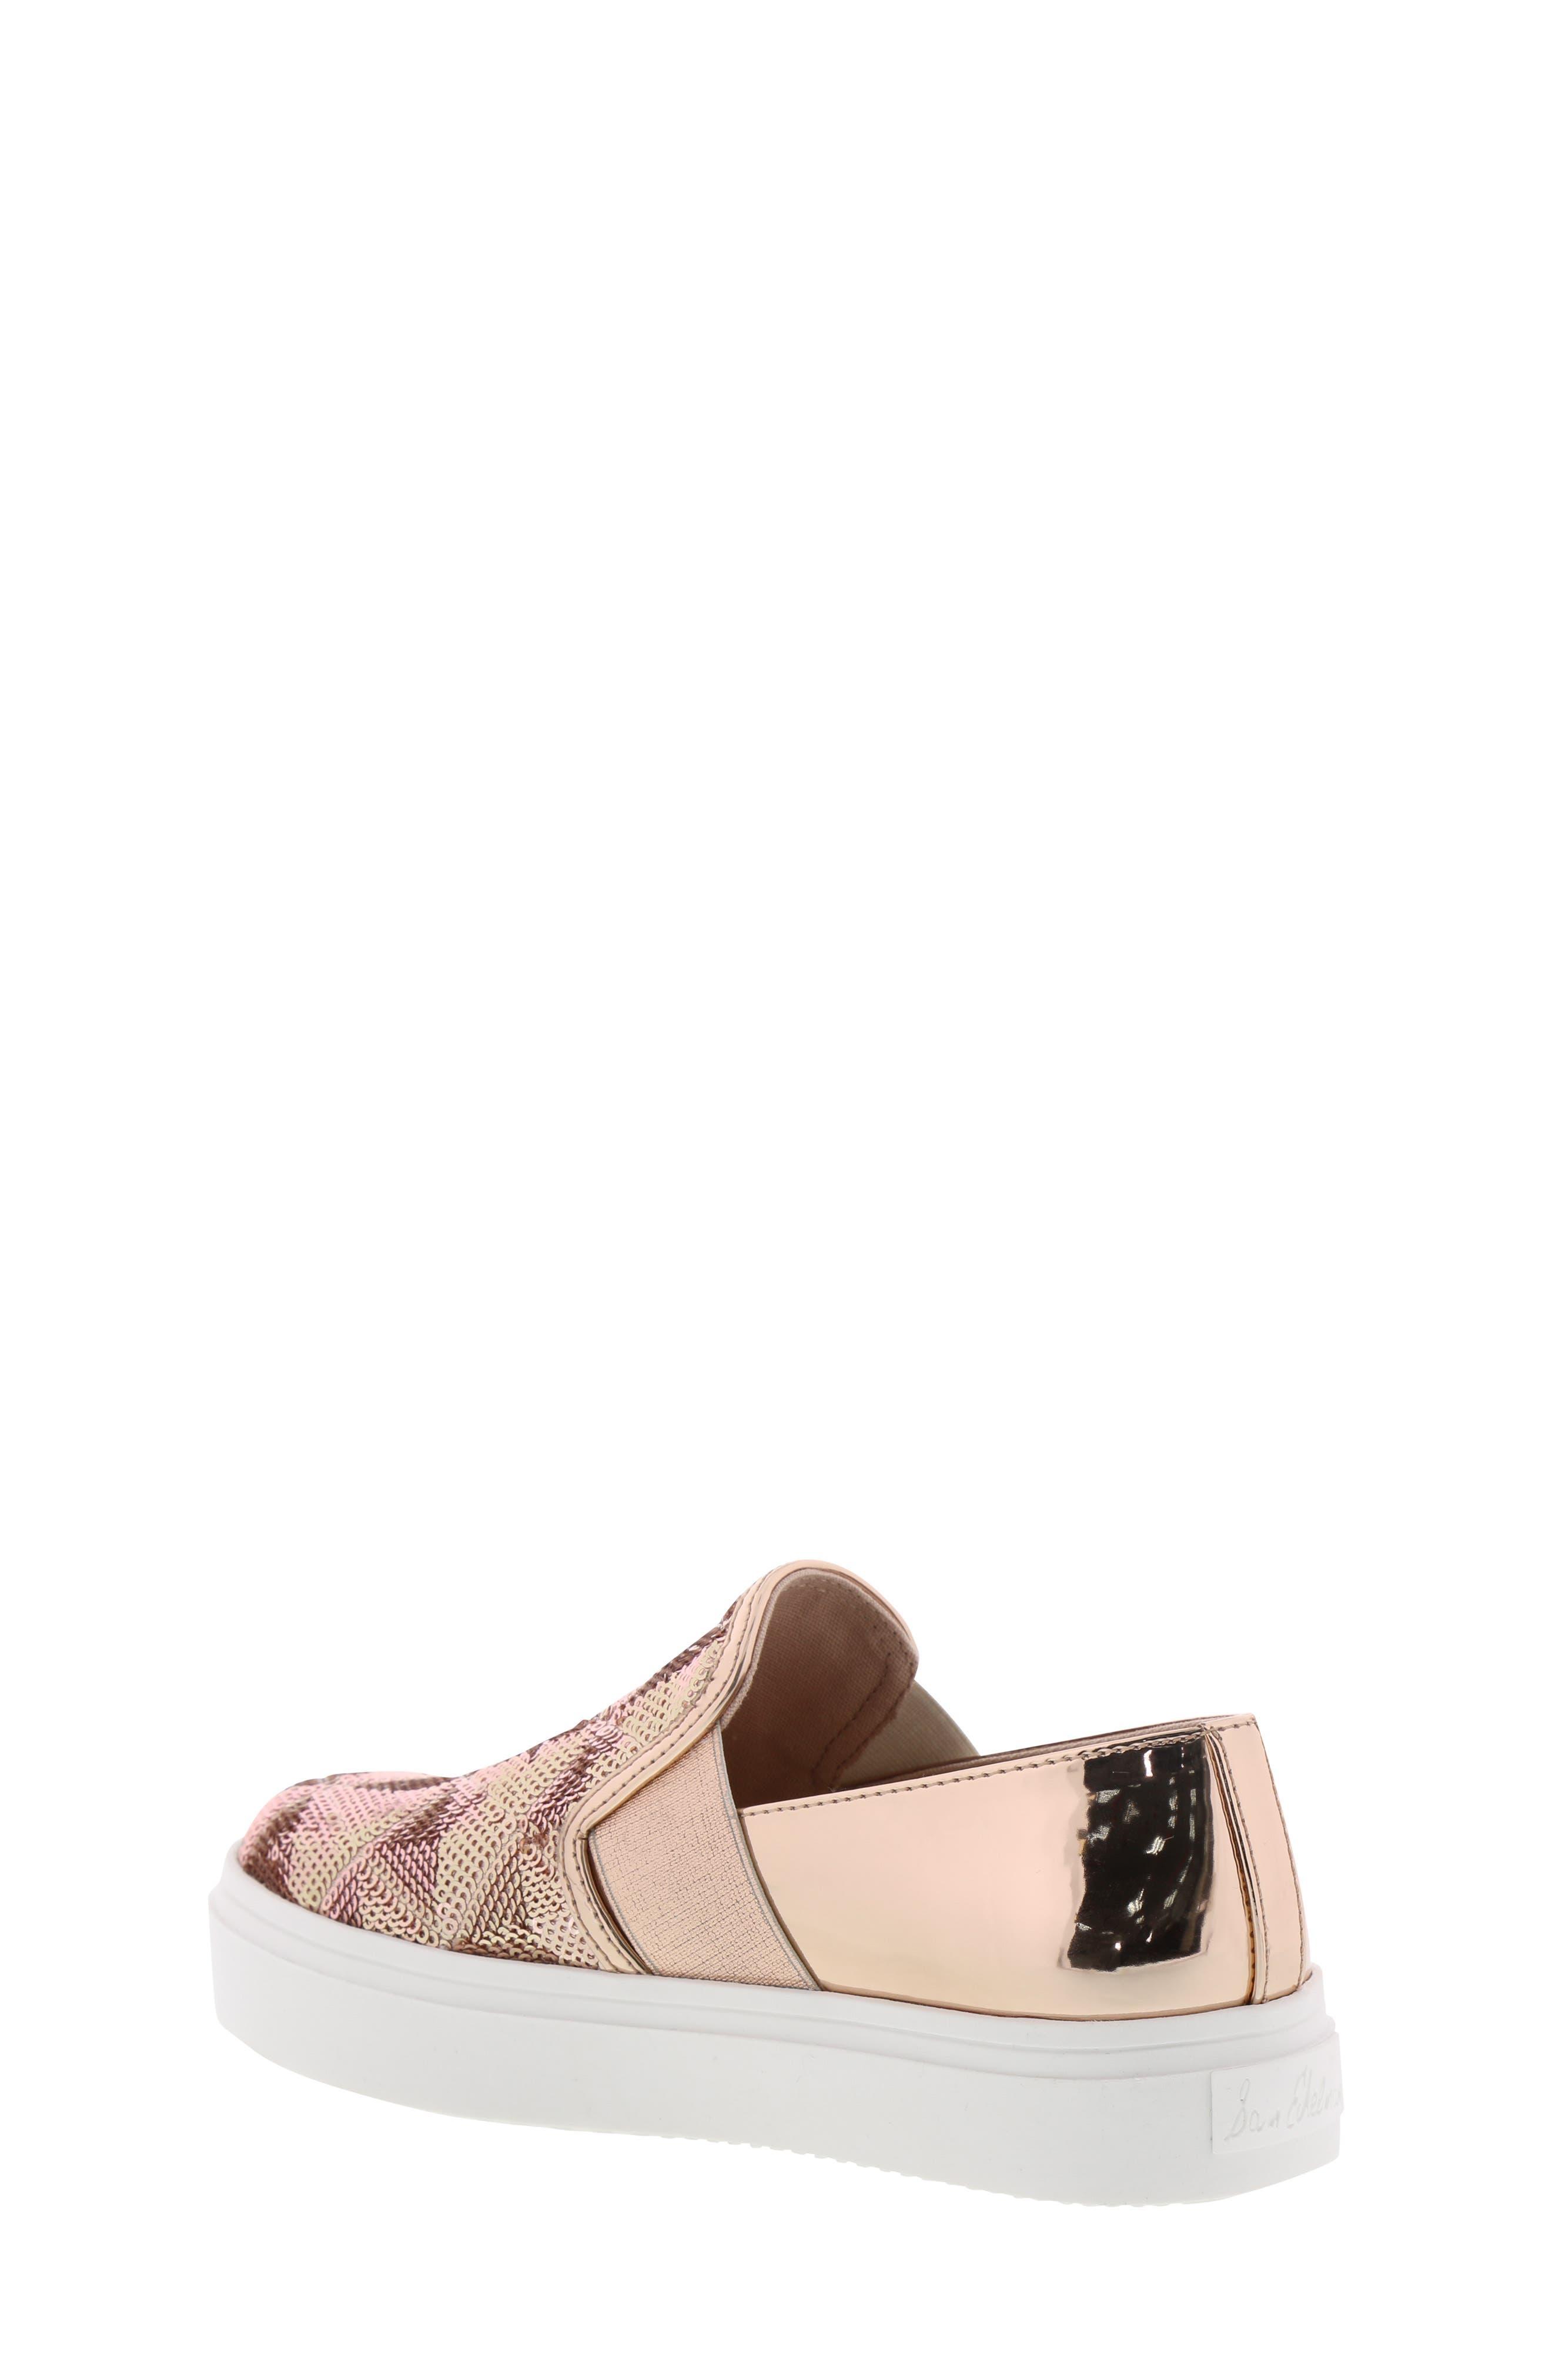 Sheena Pam Sequin Sneaker,                             Alternate thumbnail 2, color,                             ROSE GOLD